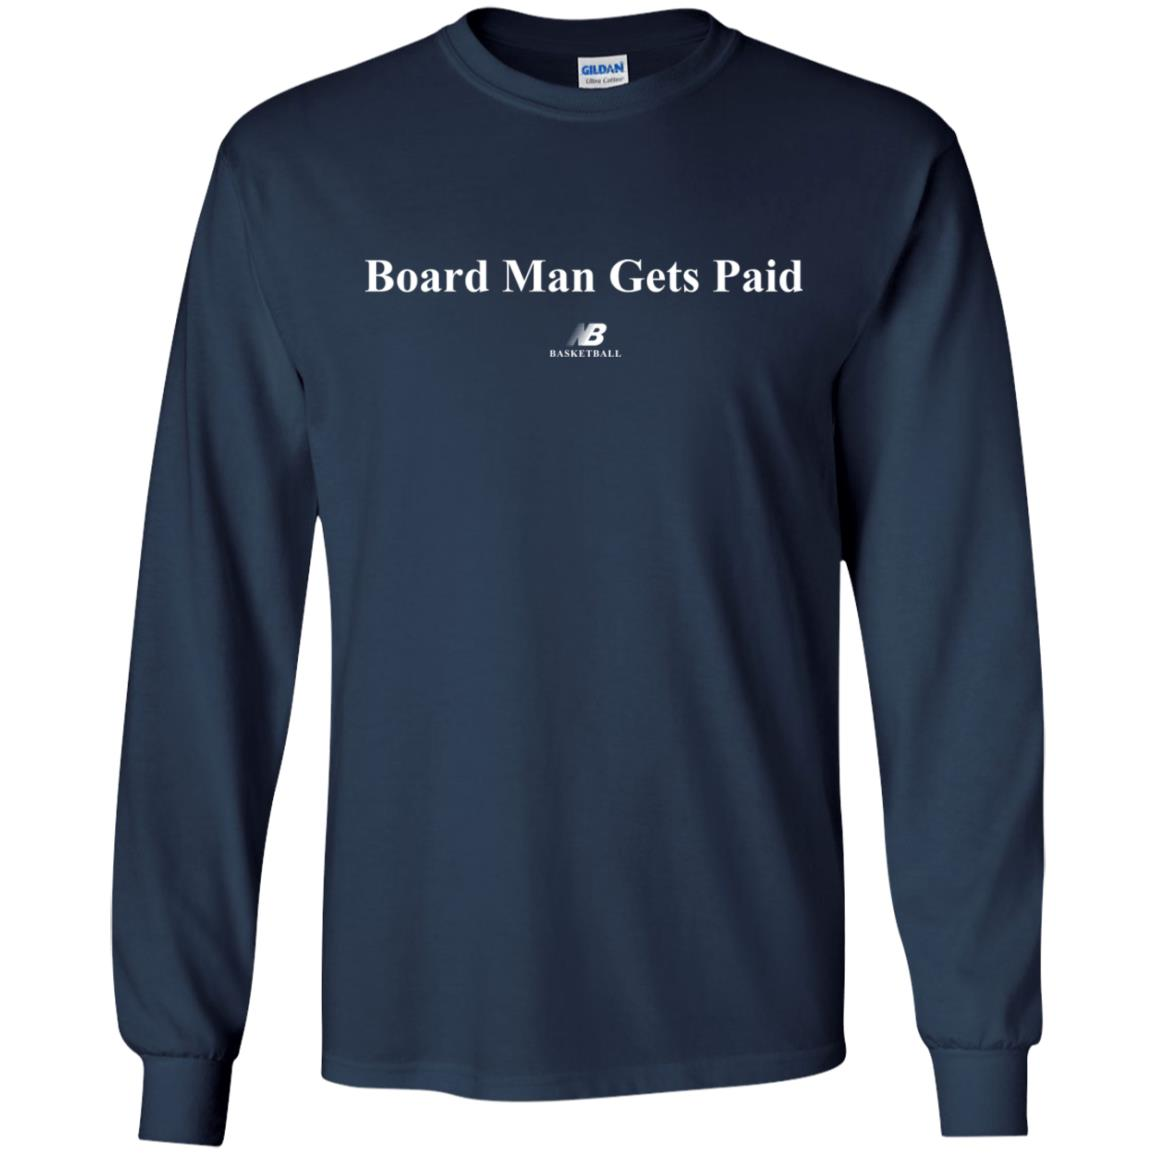 Kawhi Leonard Board Man Gets Paid shirt